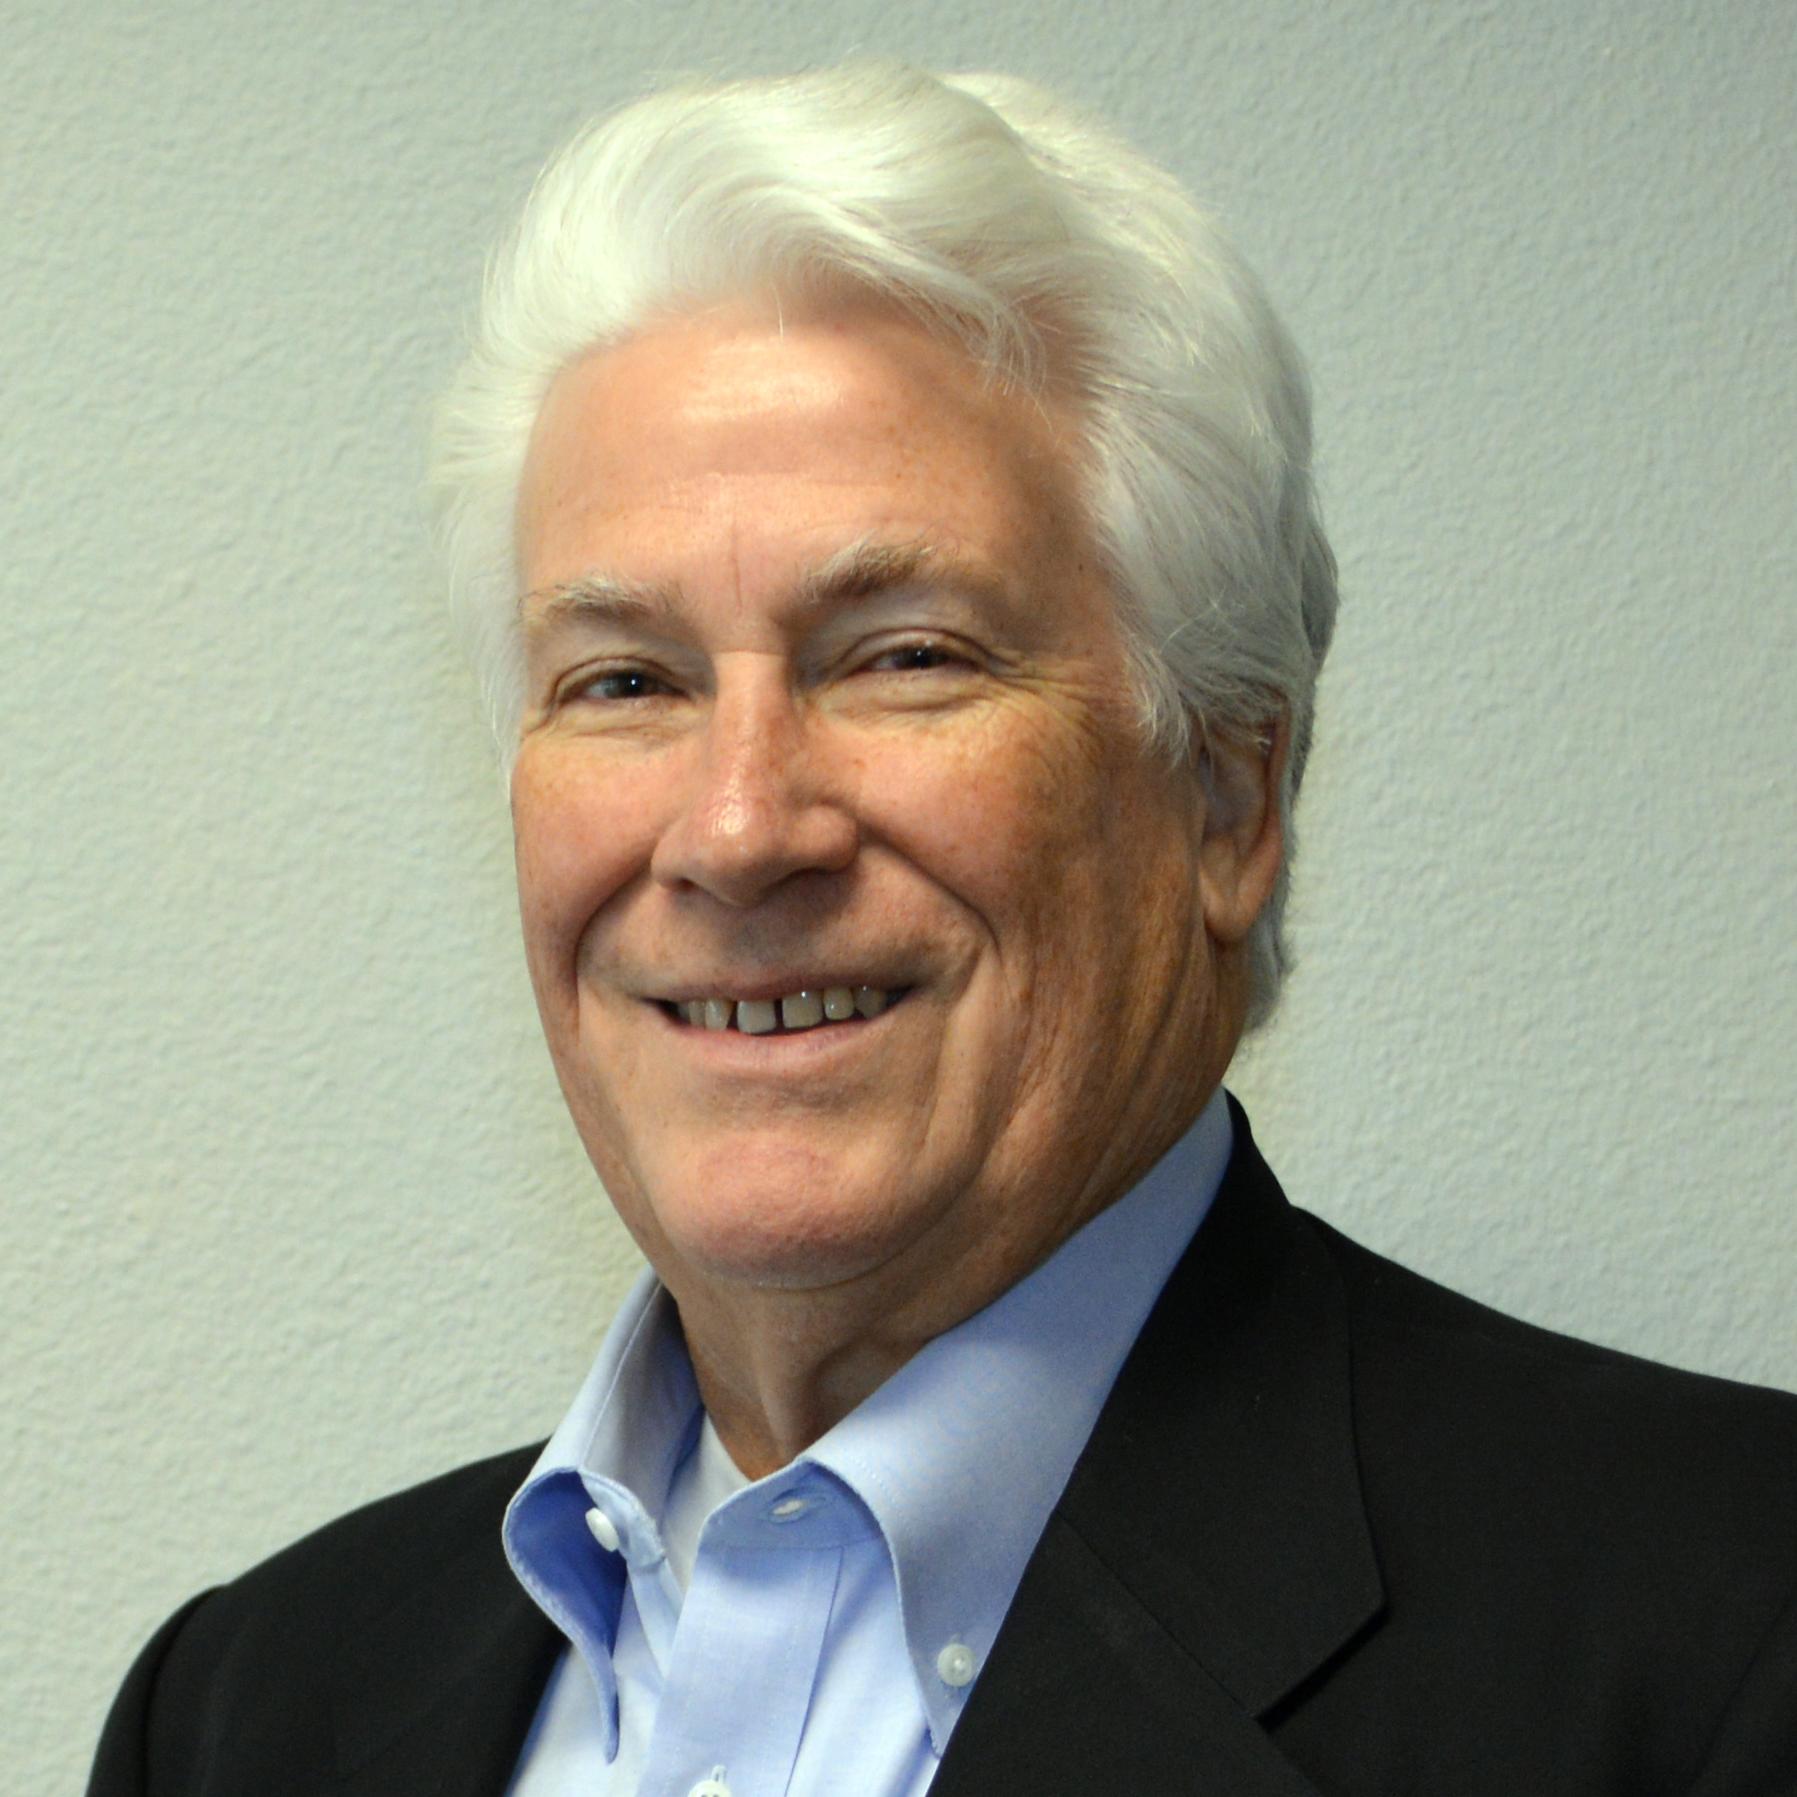 Allan Fulsher, Secretary